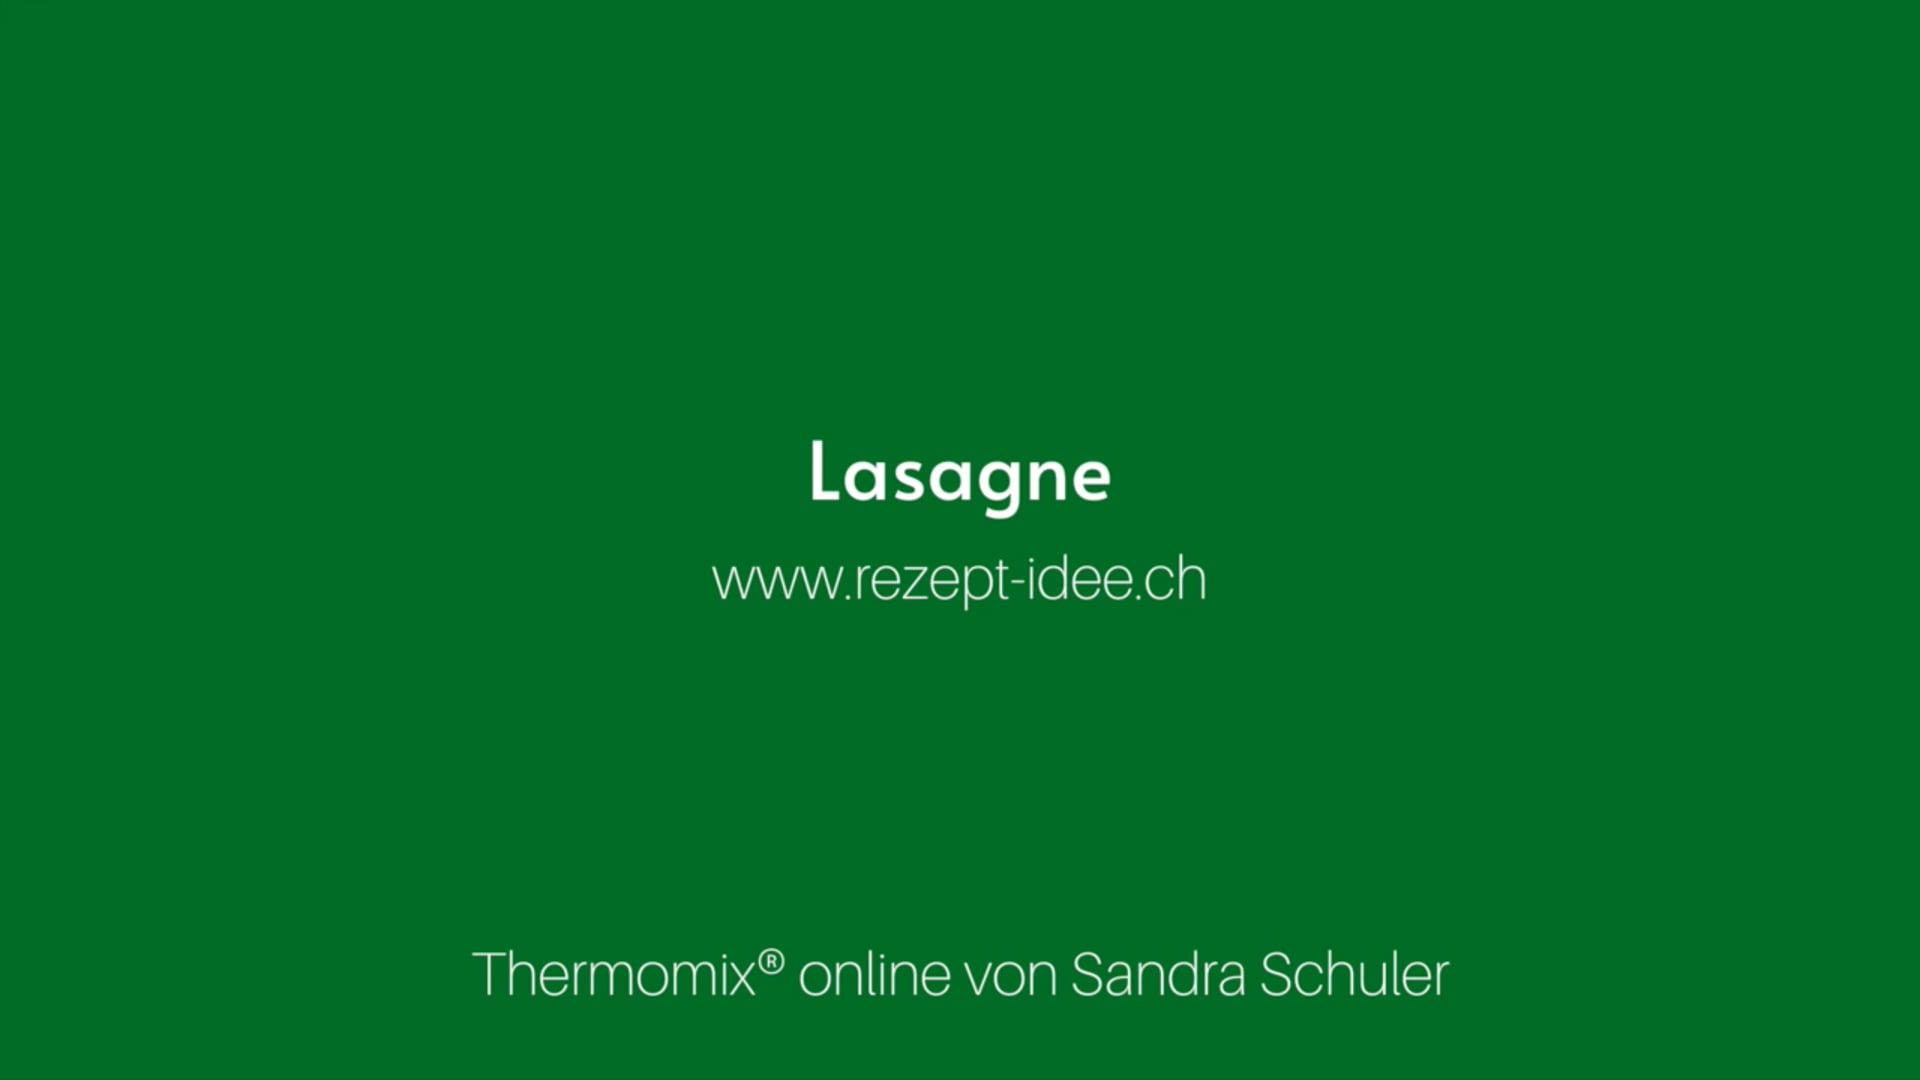 Lasagne - Sandra Schuler - Rezept-Idee.ch